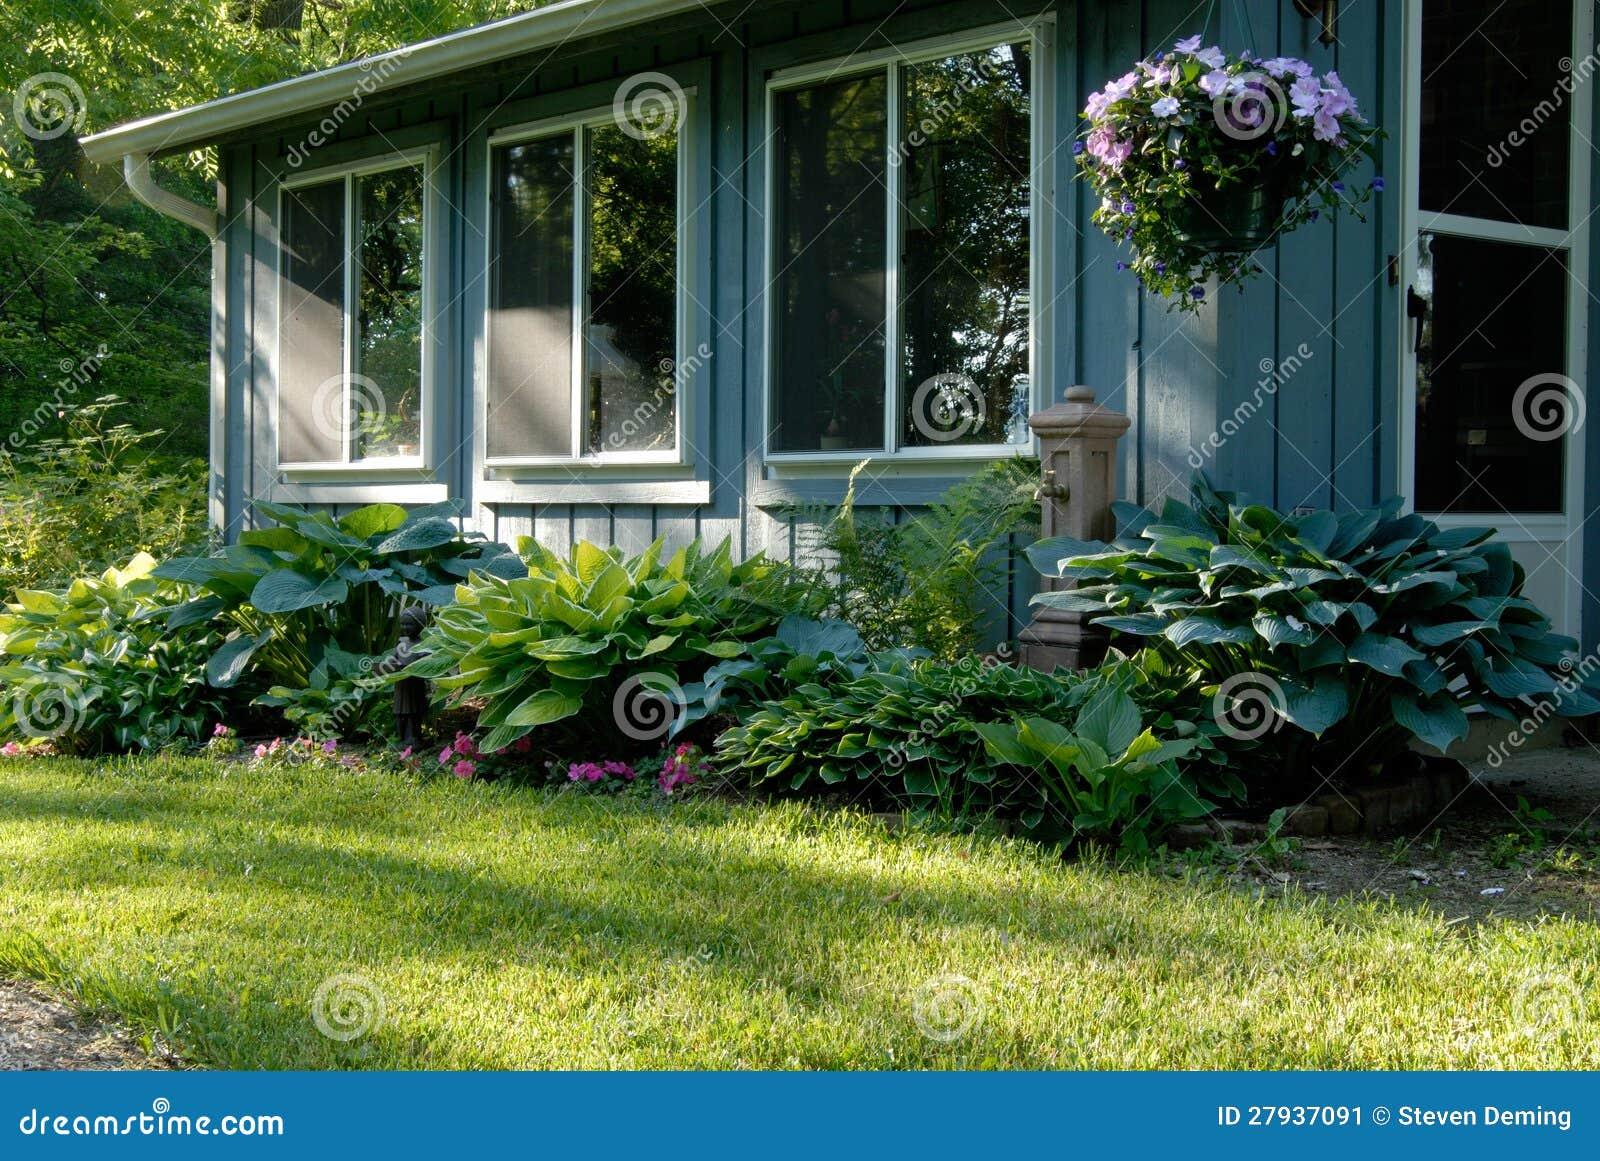 un jardin d 39 ombre de hosta image stock image du pelouse 27937091. Black Bedroom Furniture Sets. Home Design Ideas